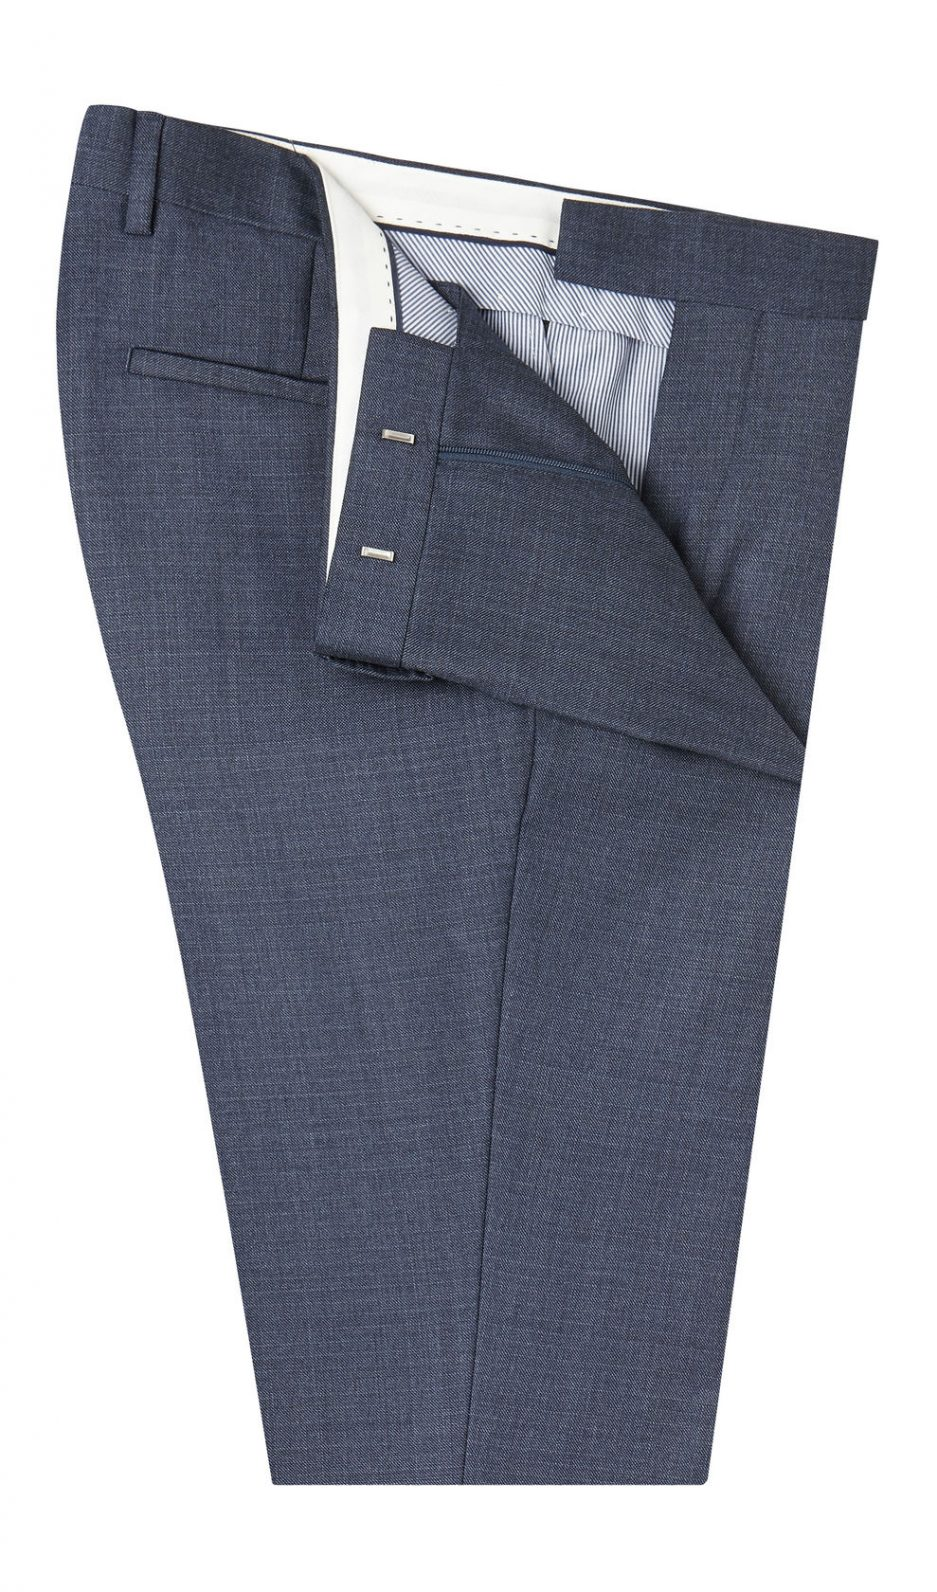 mens trouser, tailored trouser nigeria